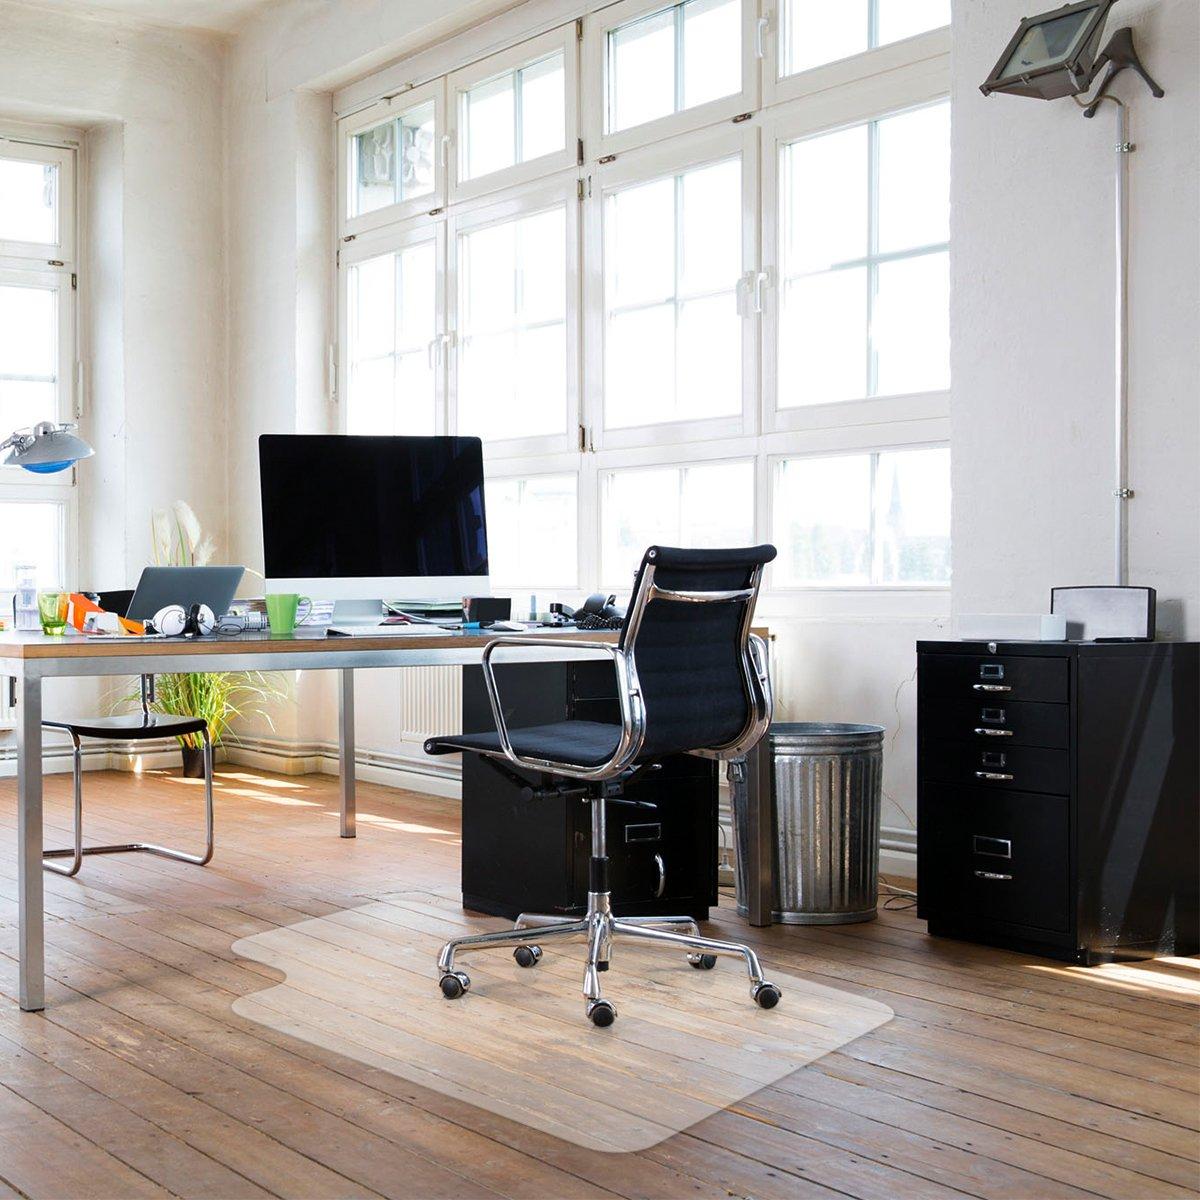 Sturdy Desk Chair Mat for Hardwood Floors Transparent Non Slip Premium Quality Floor Mat 36'' X 48''